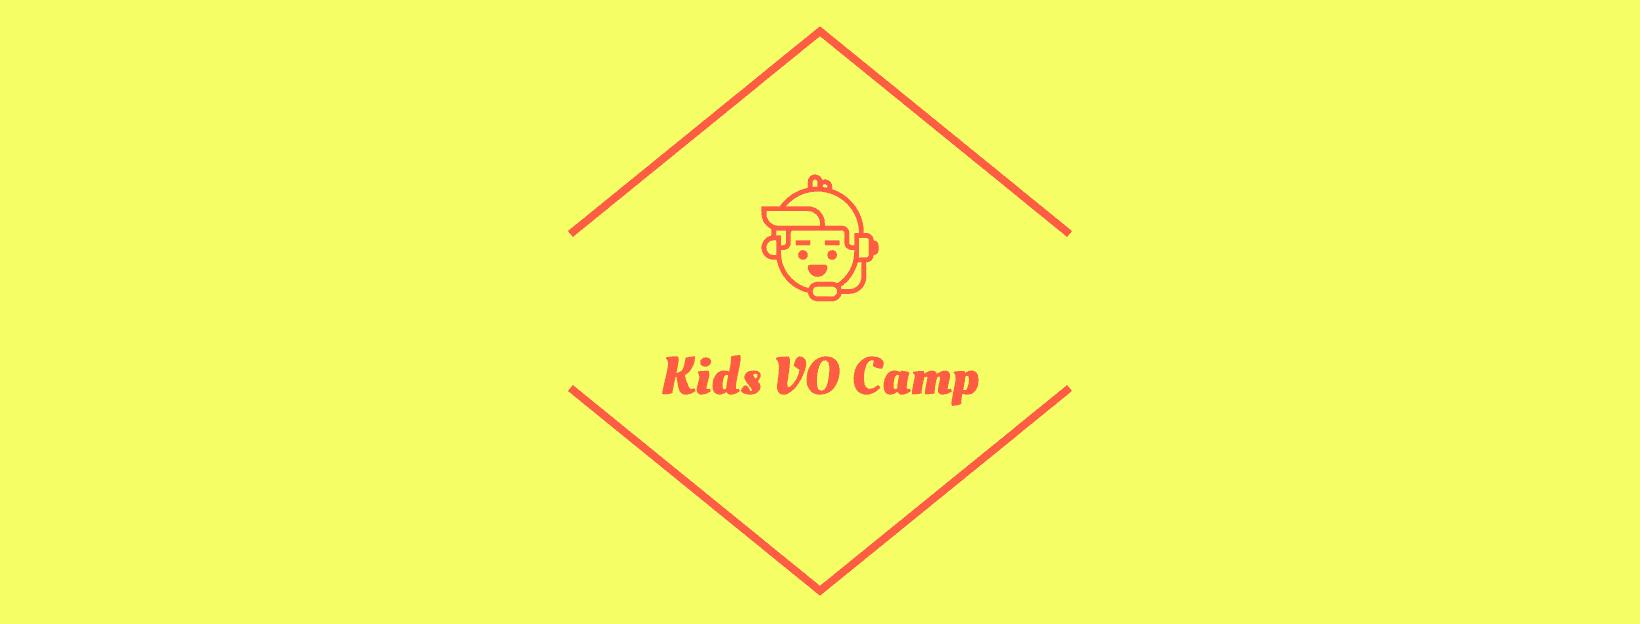 kids vo camp header image